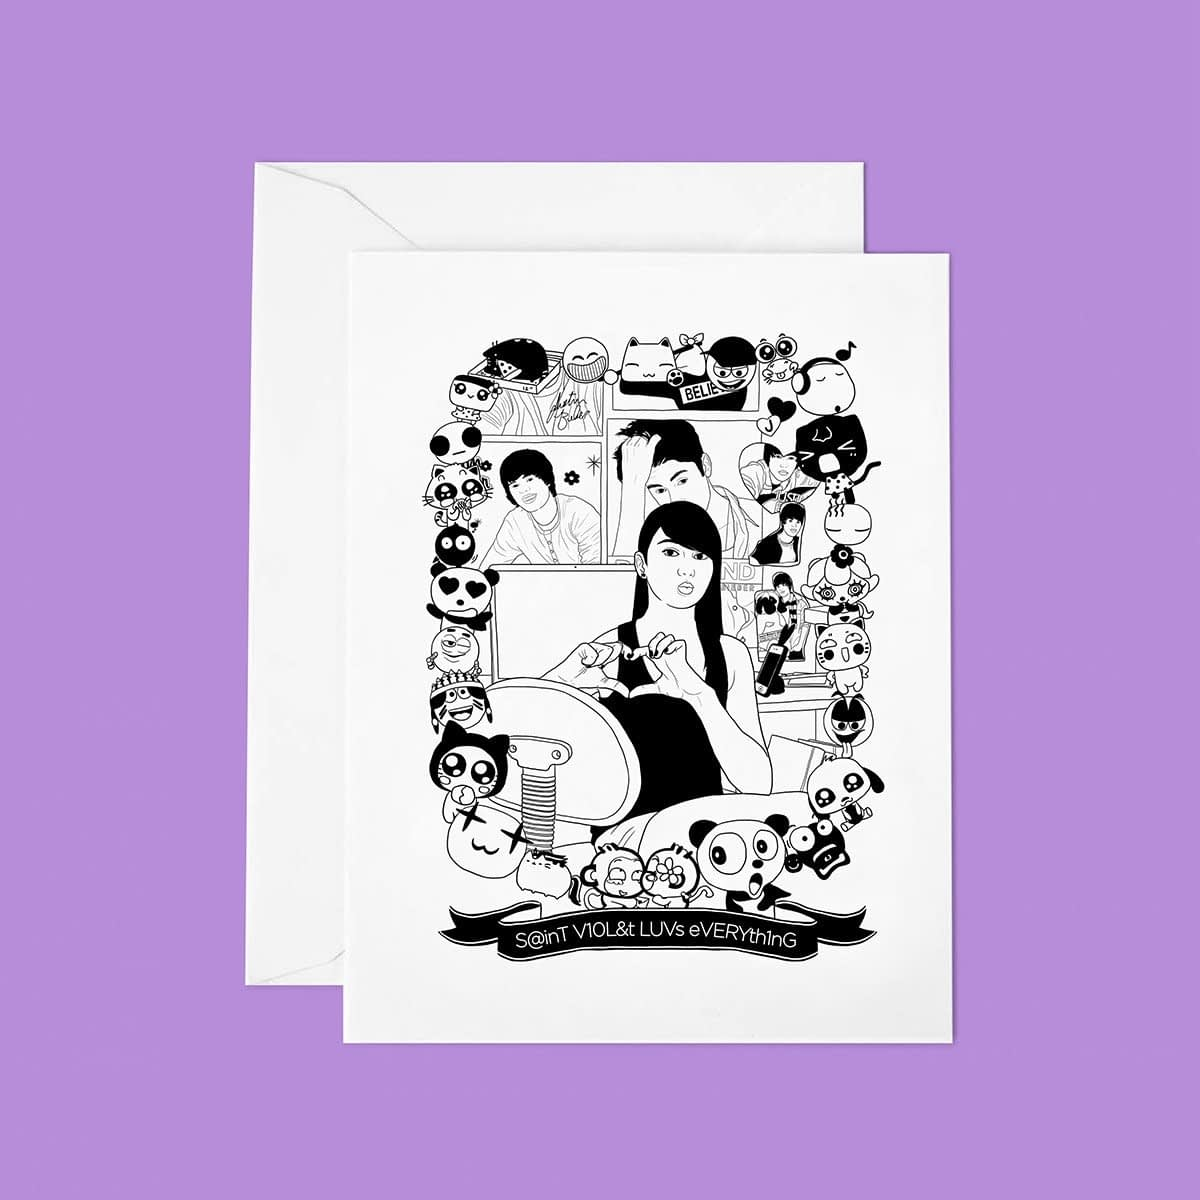 TUTTISANTI | Saint Violet LUVs everything